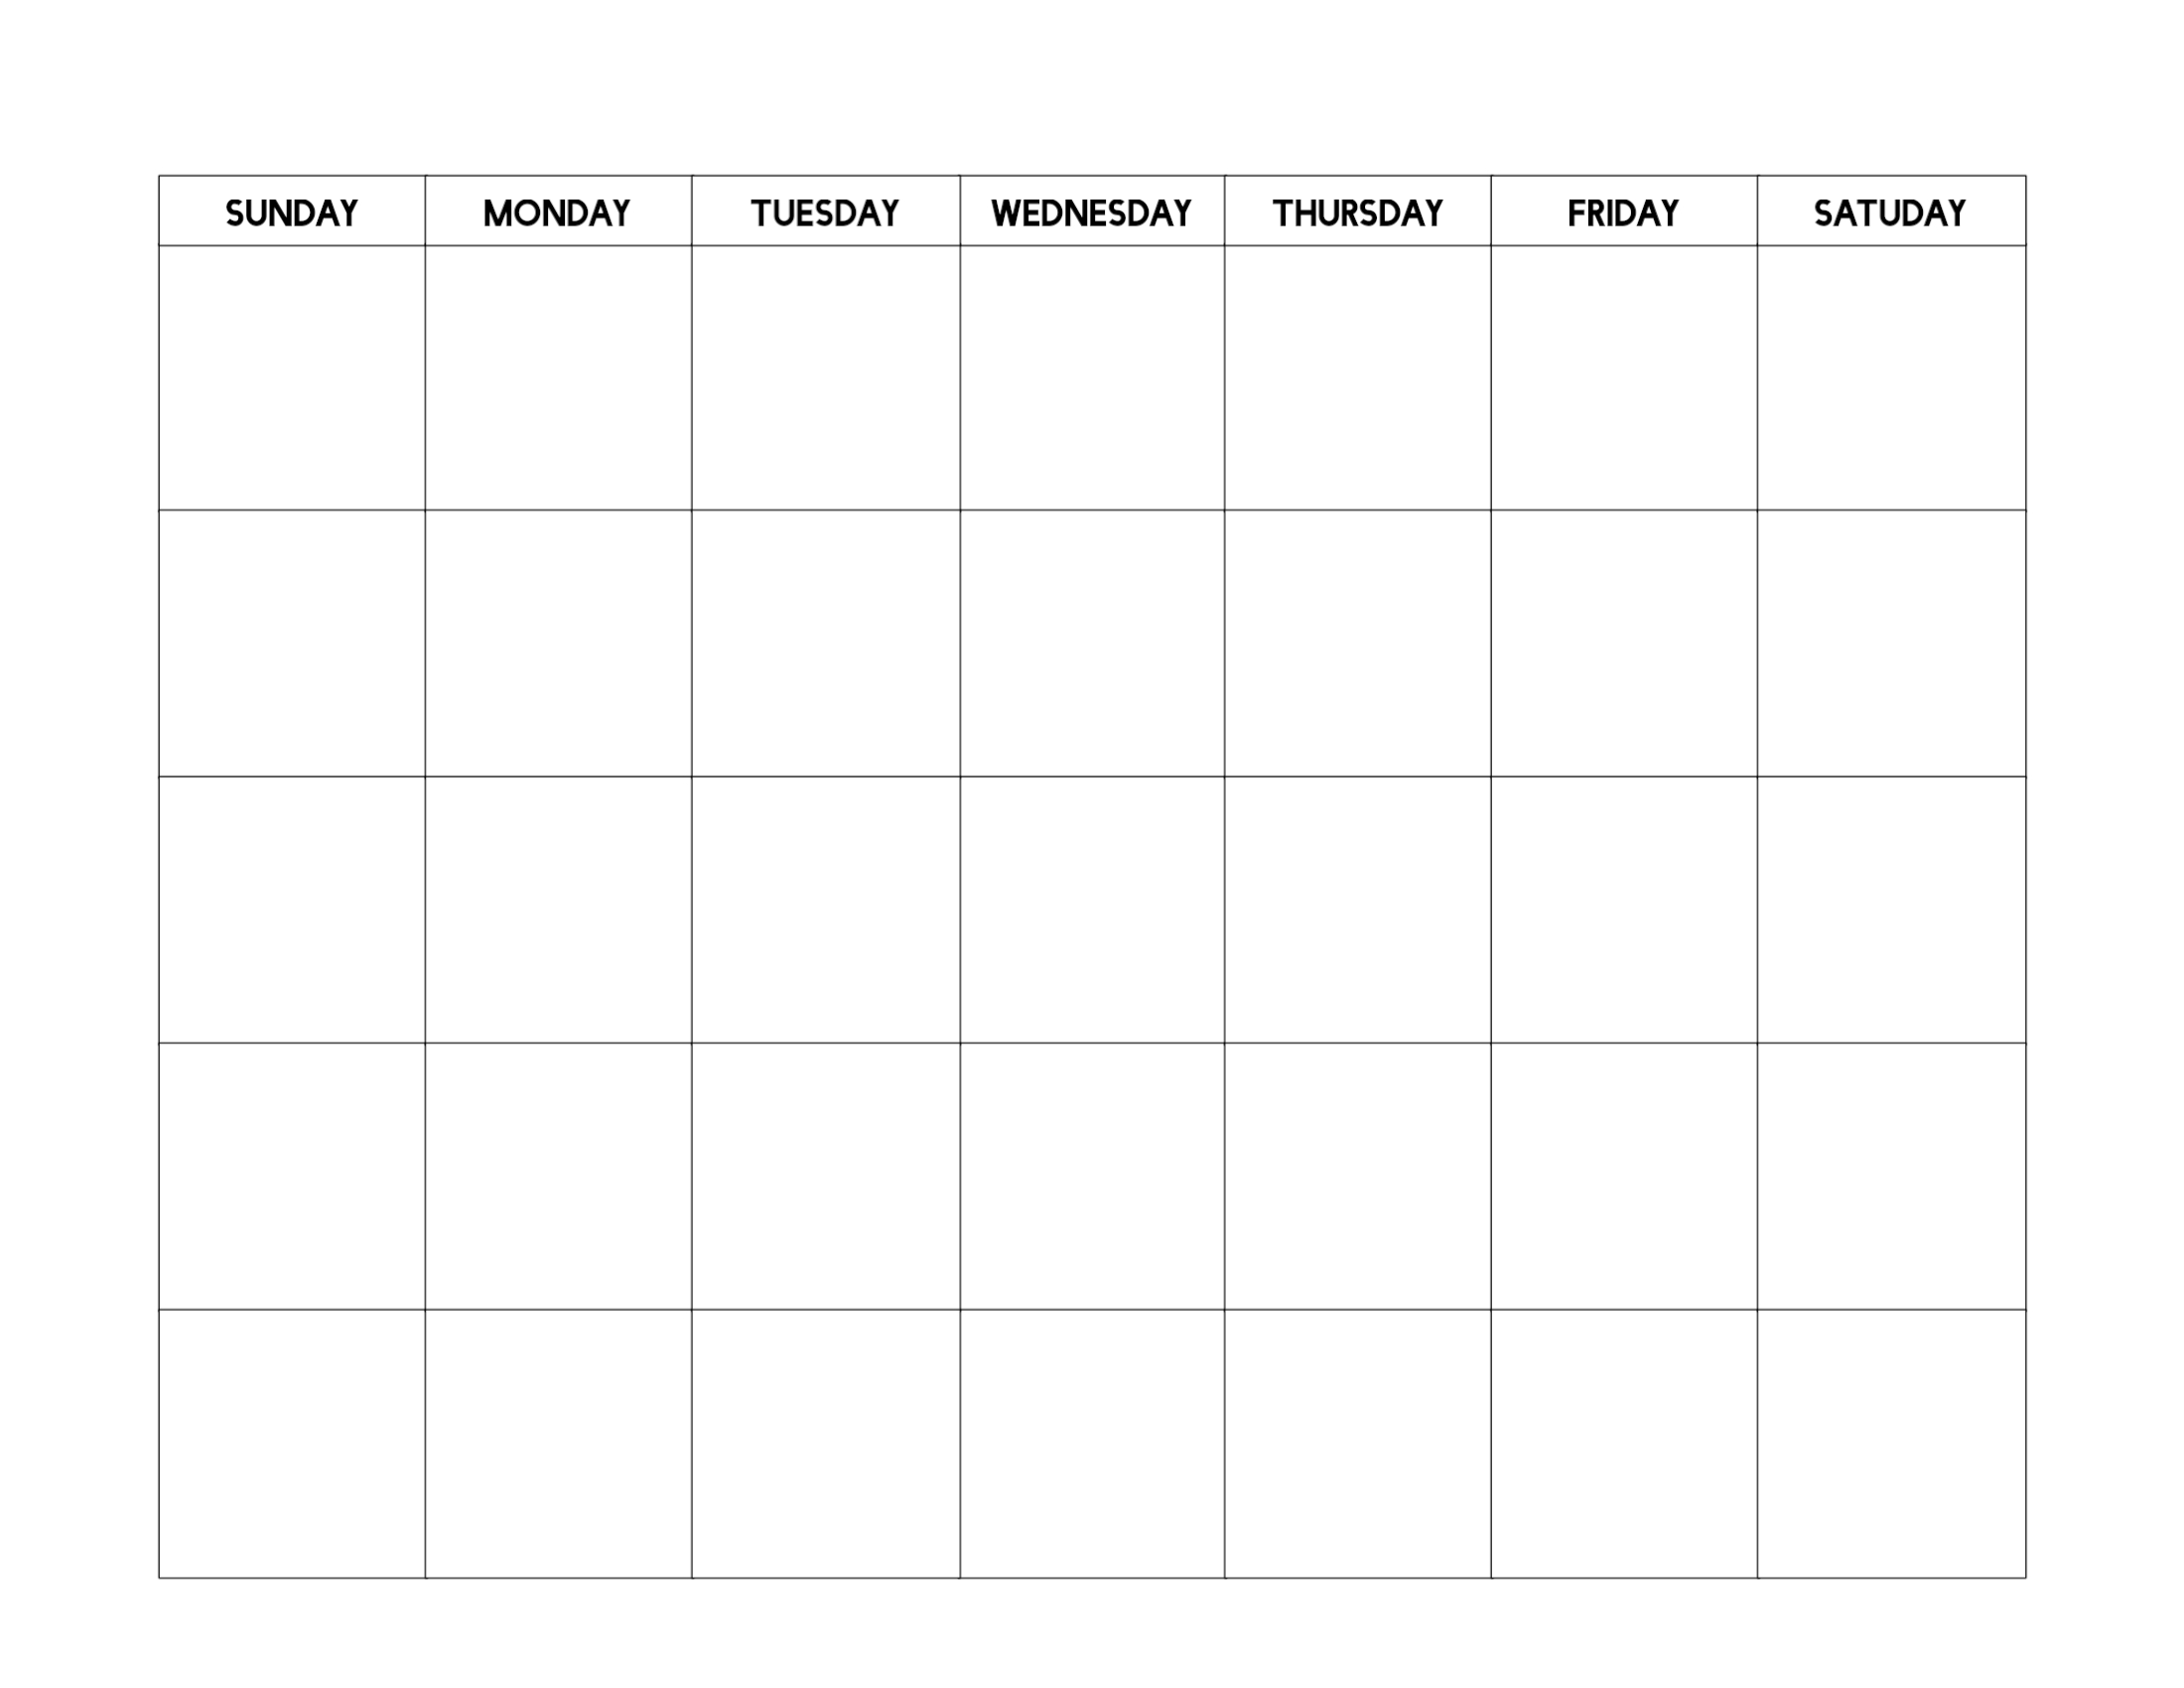 Free Printable Blank Calendar Template - Paper Trail Design-Printable Blank Calendar Sheets